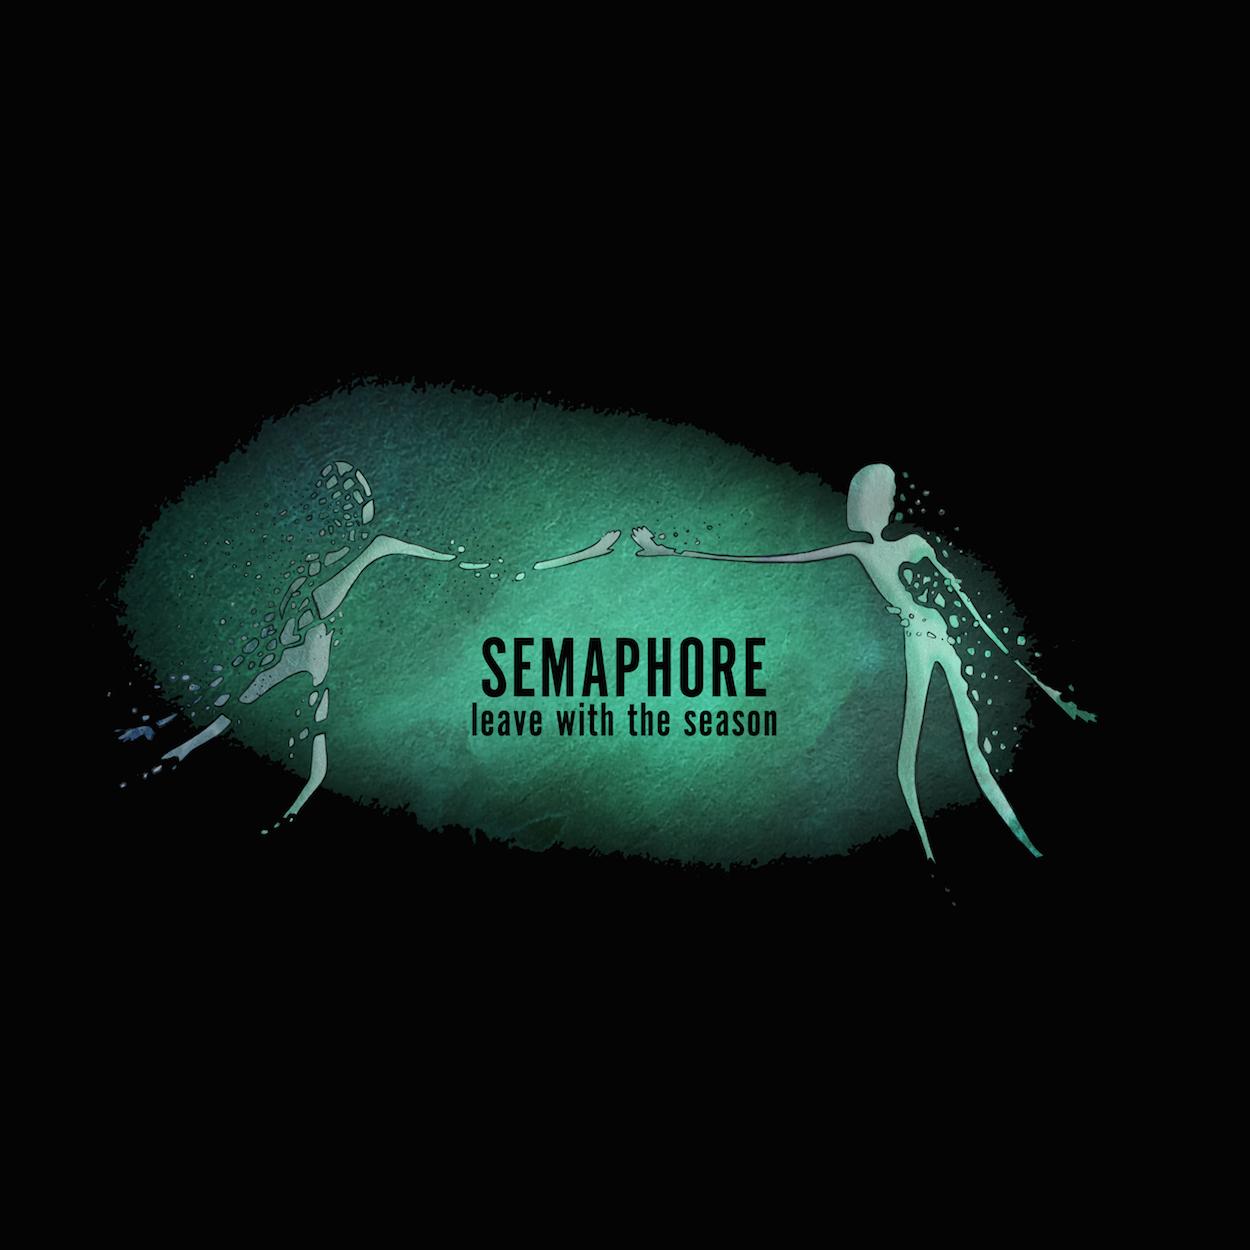 semaphore_Leave-With-the-Season-cover-art-SQUARE_hi-res_black_SMALLER.jpg